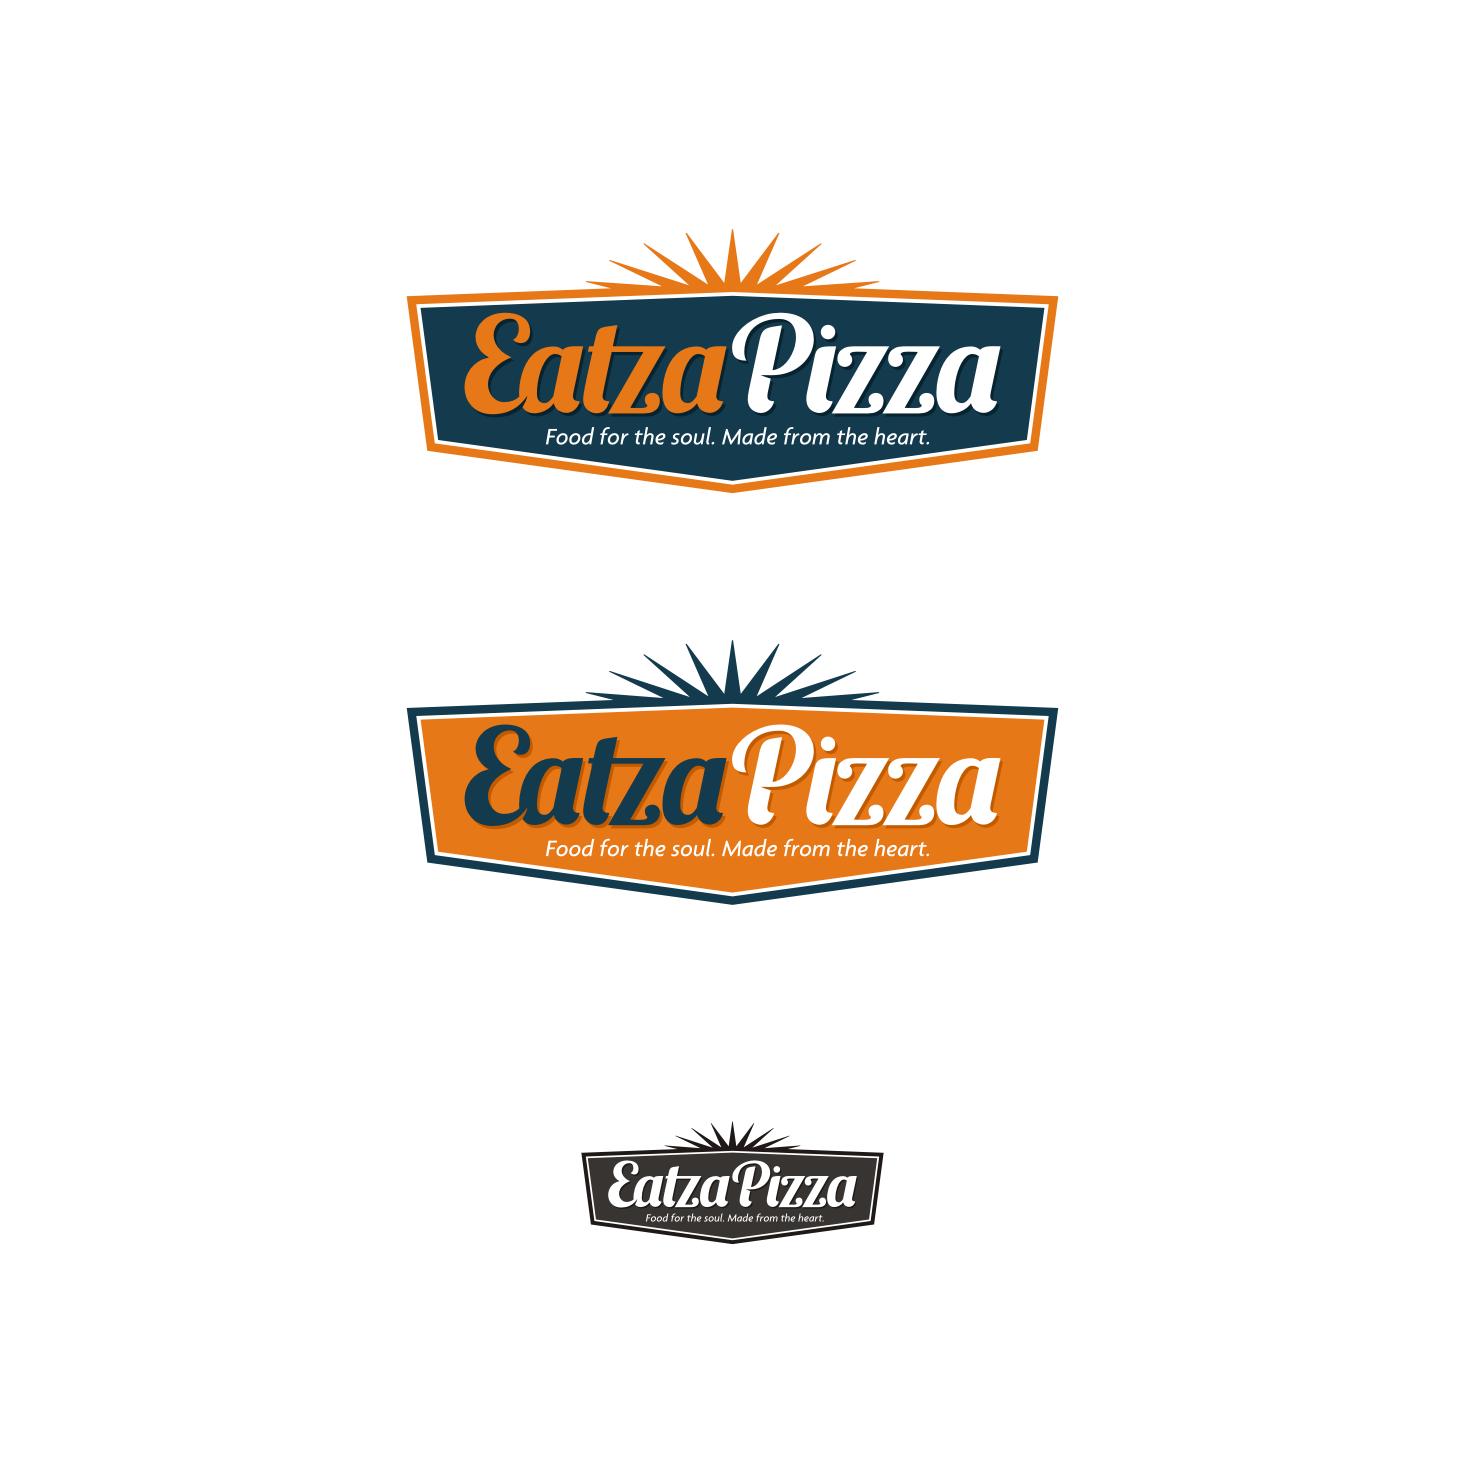 logo for Eatza Pizza